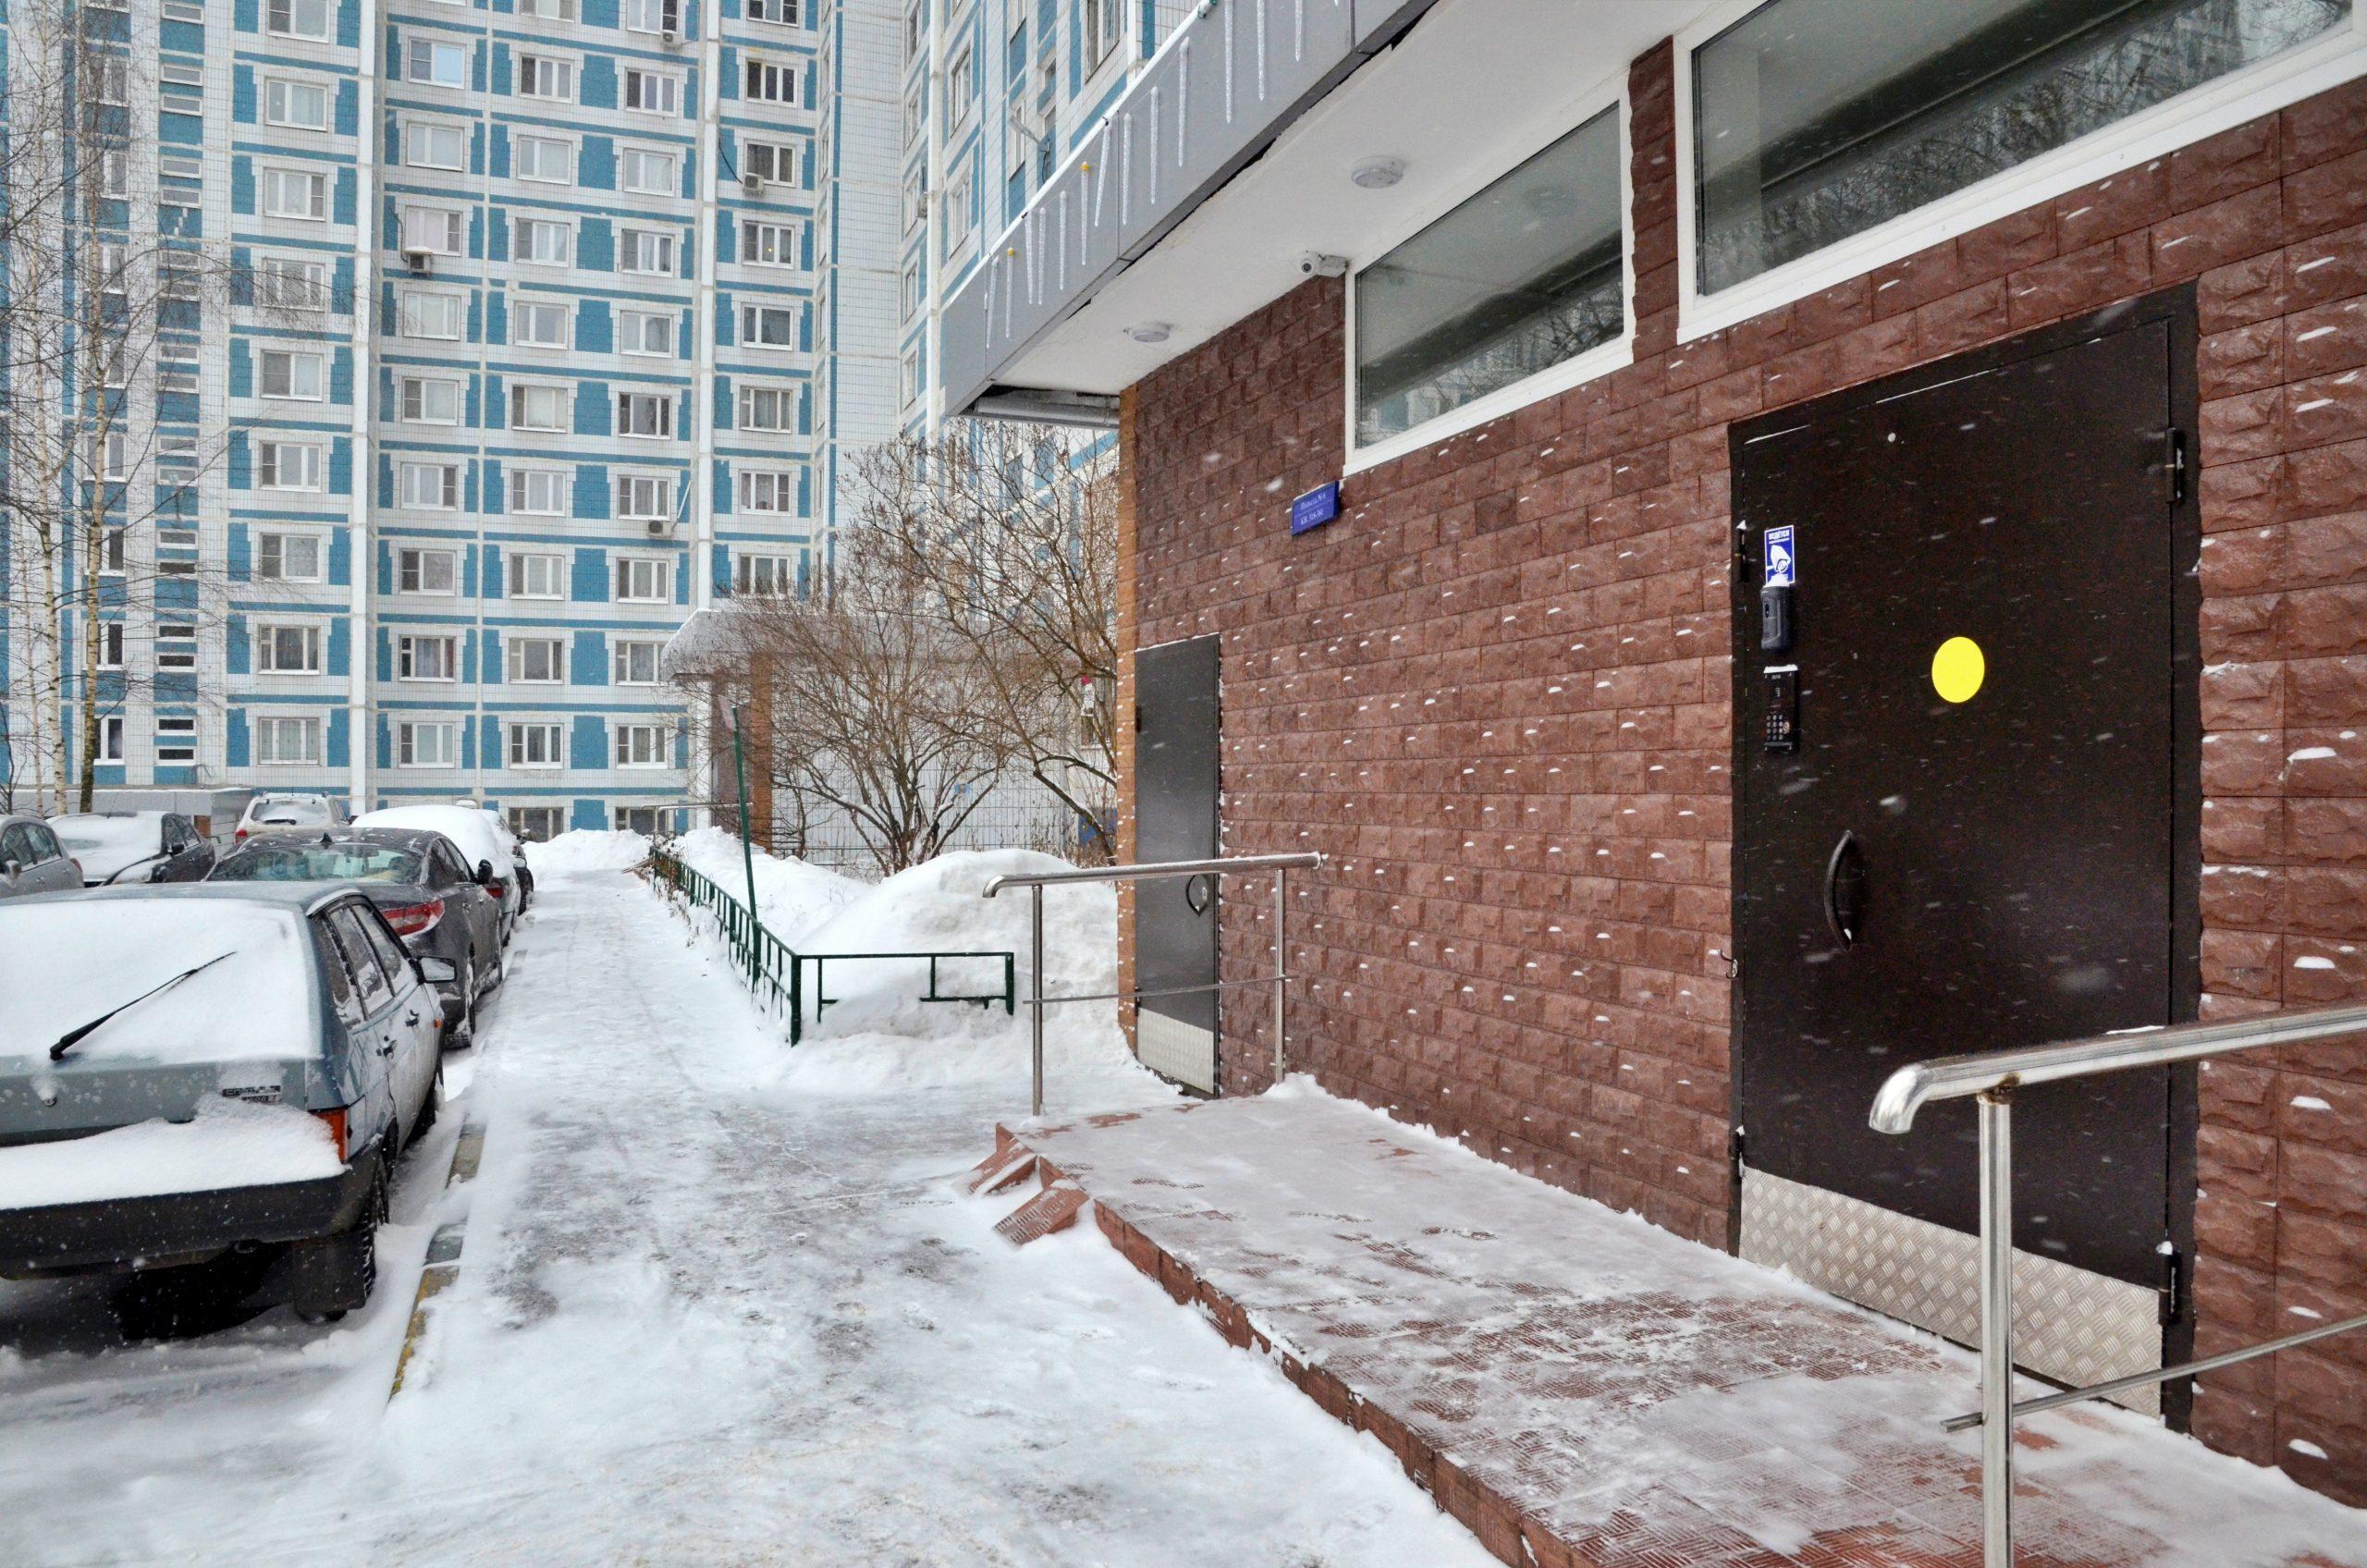 Проверки безопасности организовали в домах Орехова-Борисова Южного